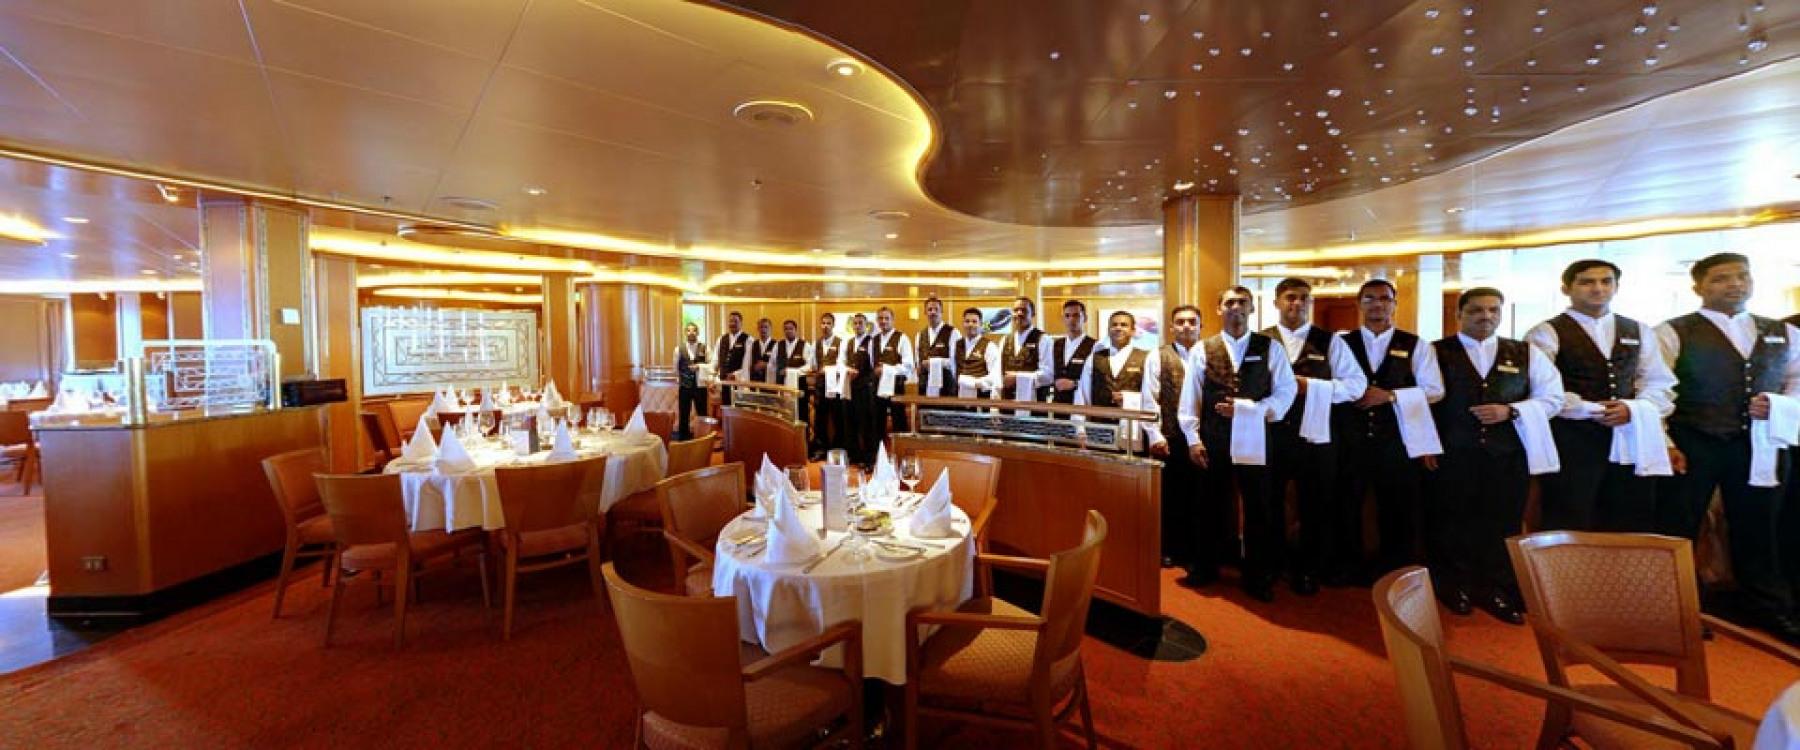 P&O Cruises Ventura Interior Saffron.jpg